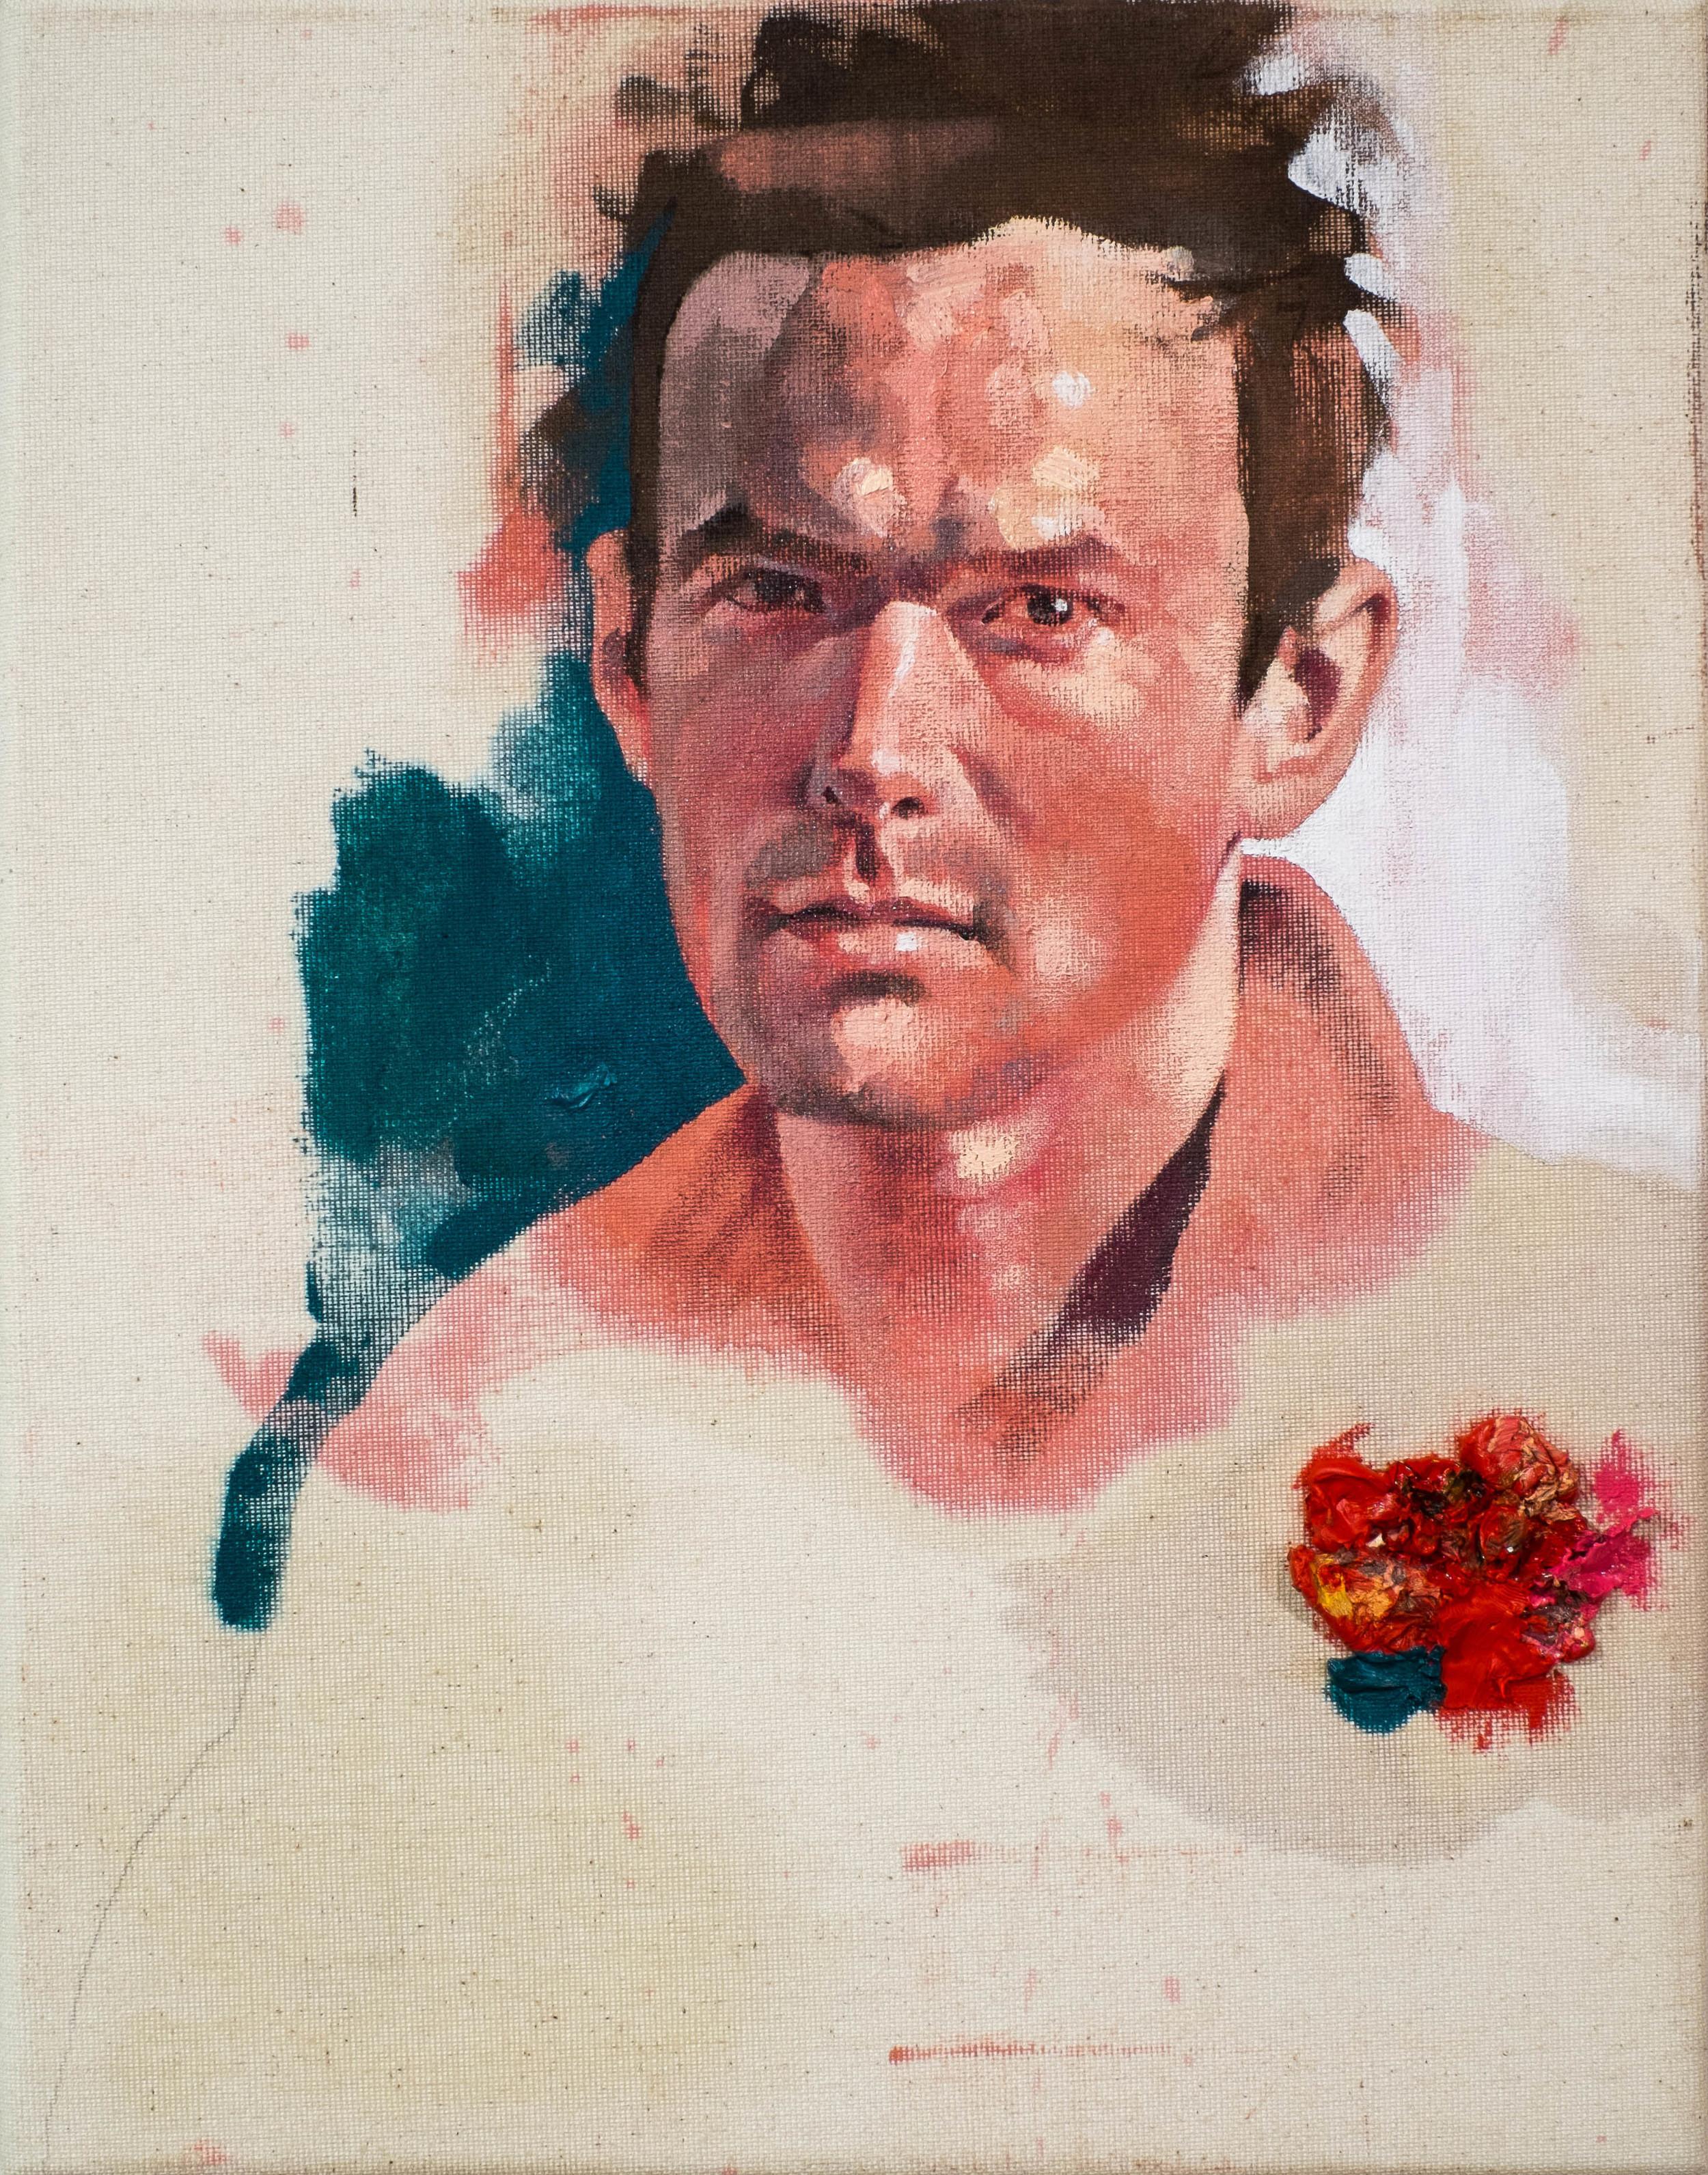 Portrait of Timothy P. Wilson